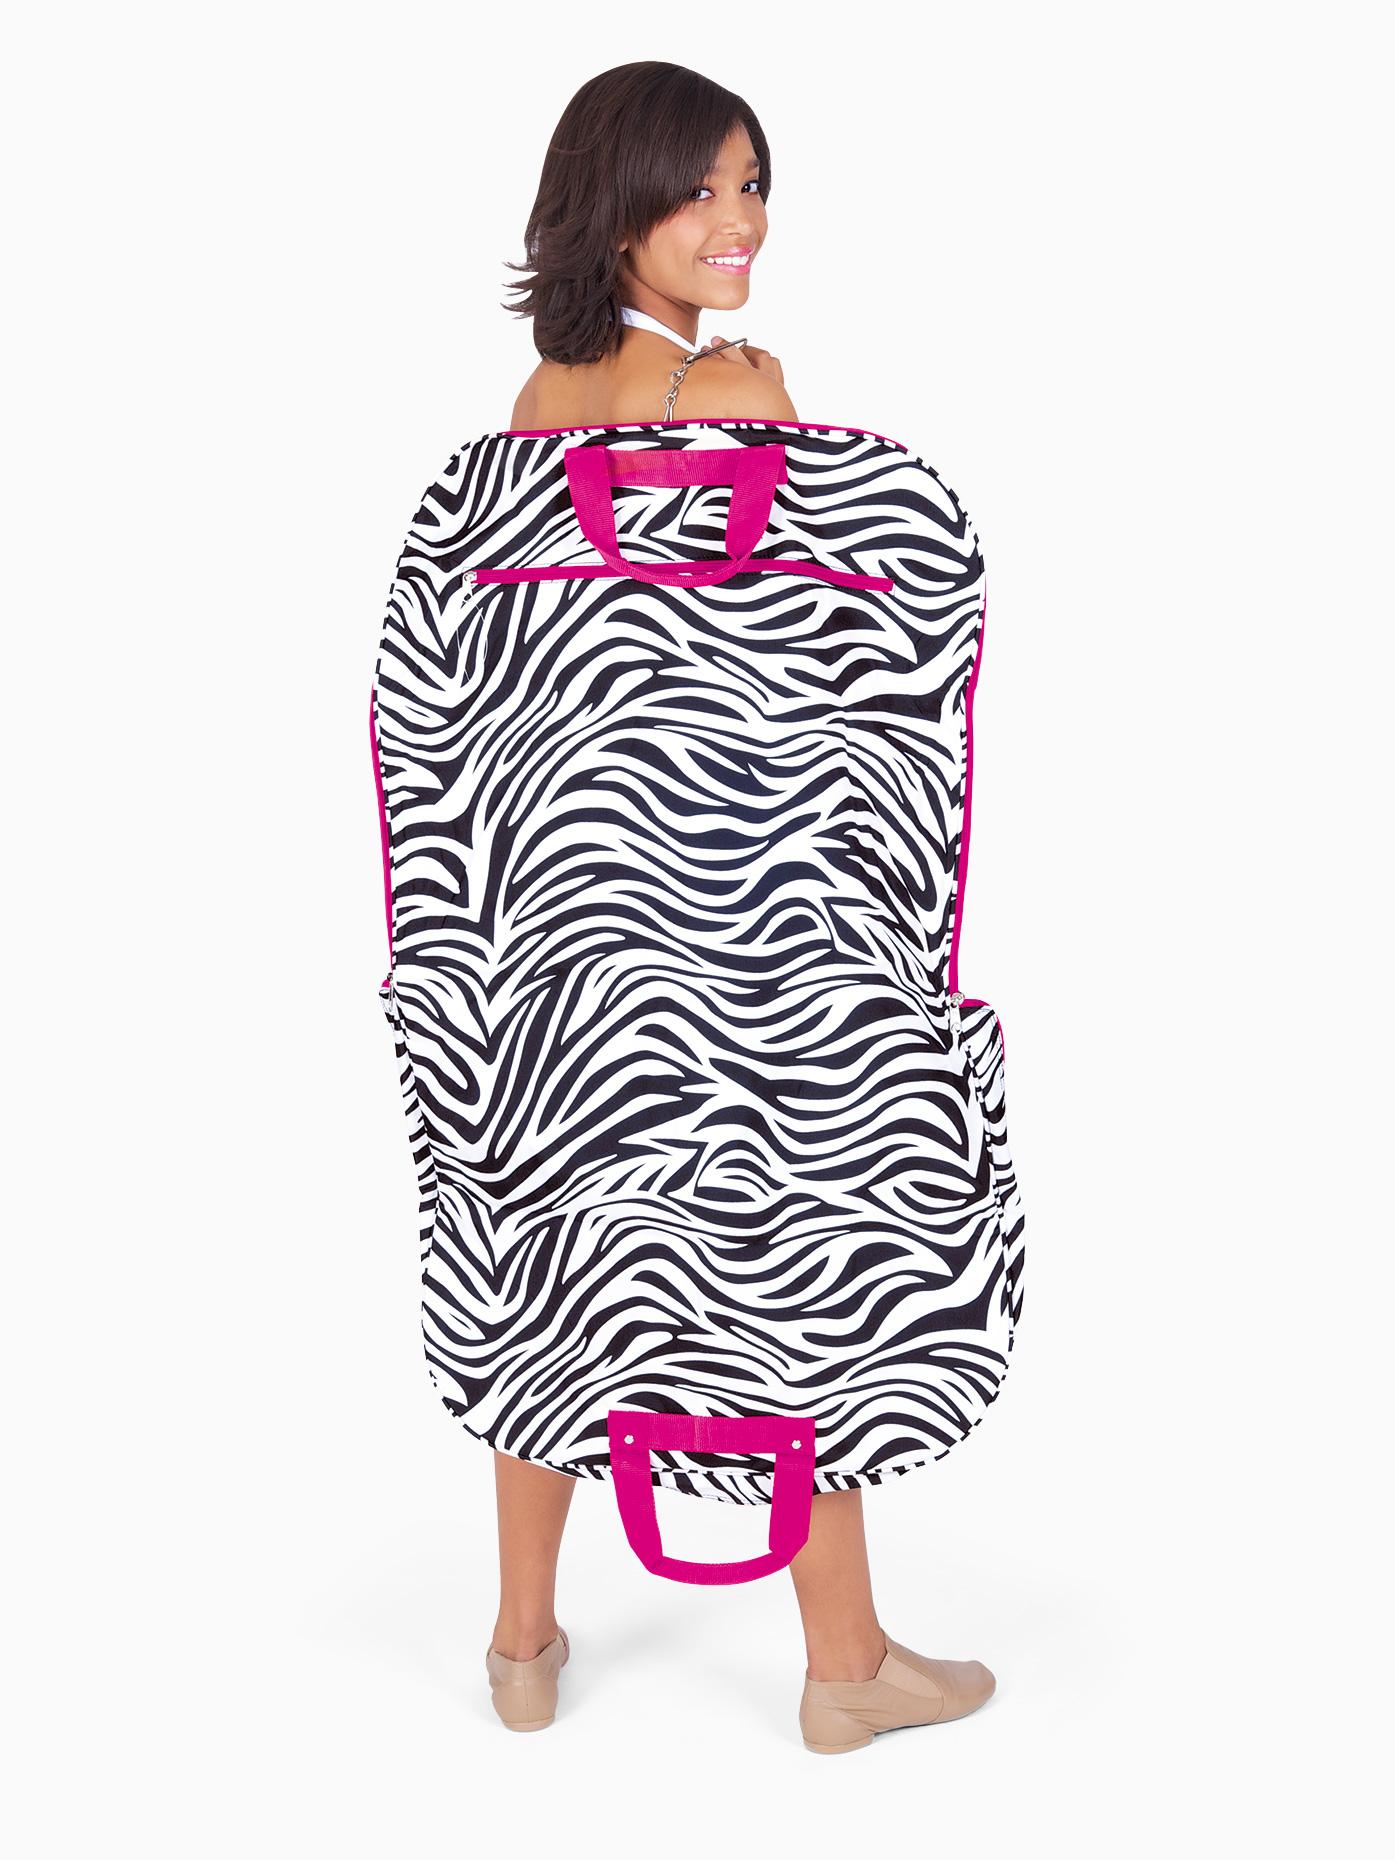 Discount Dance Supply Zebra Print Garment Bag GM40